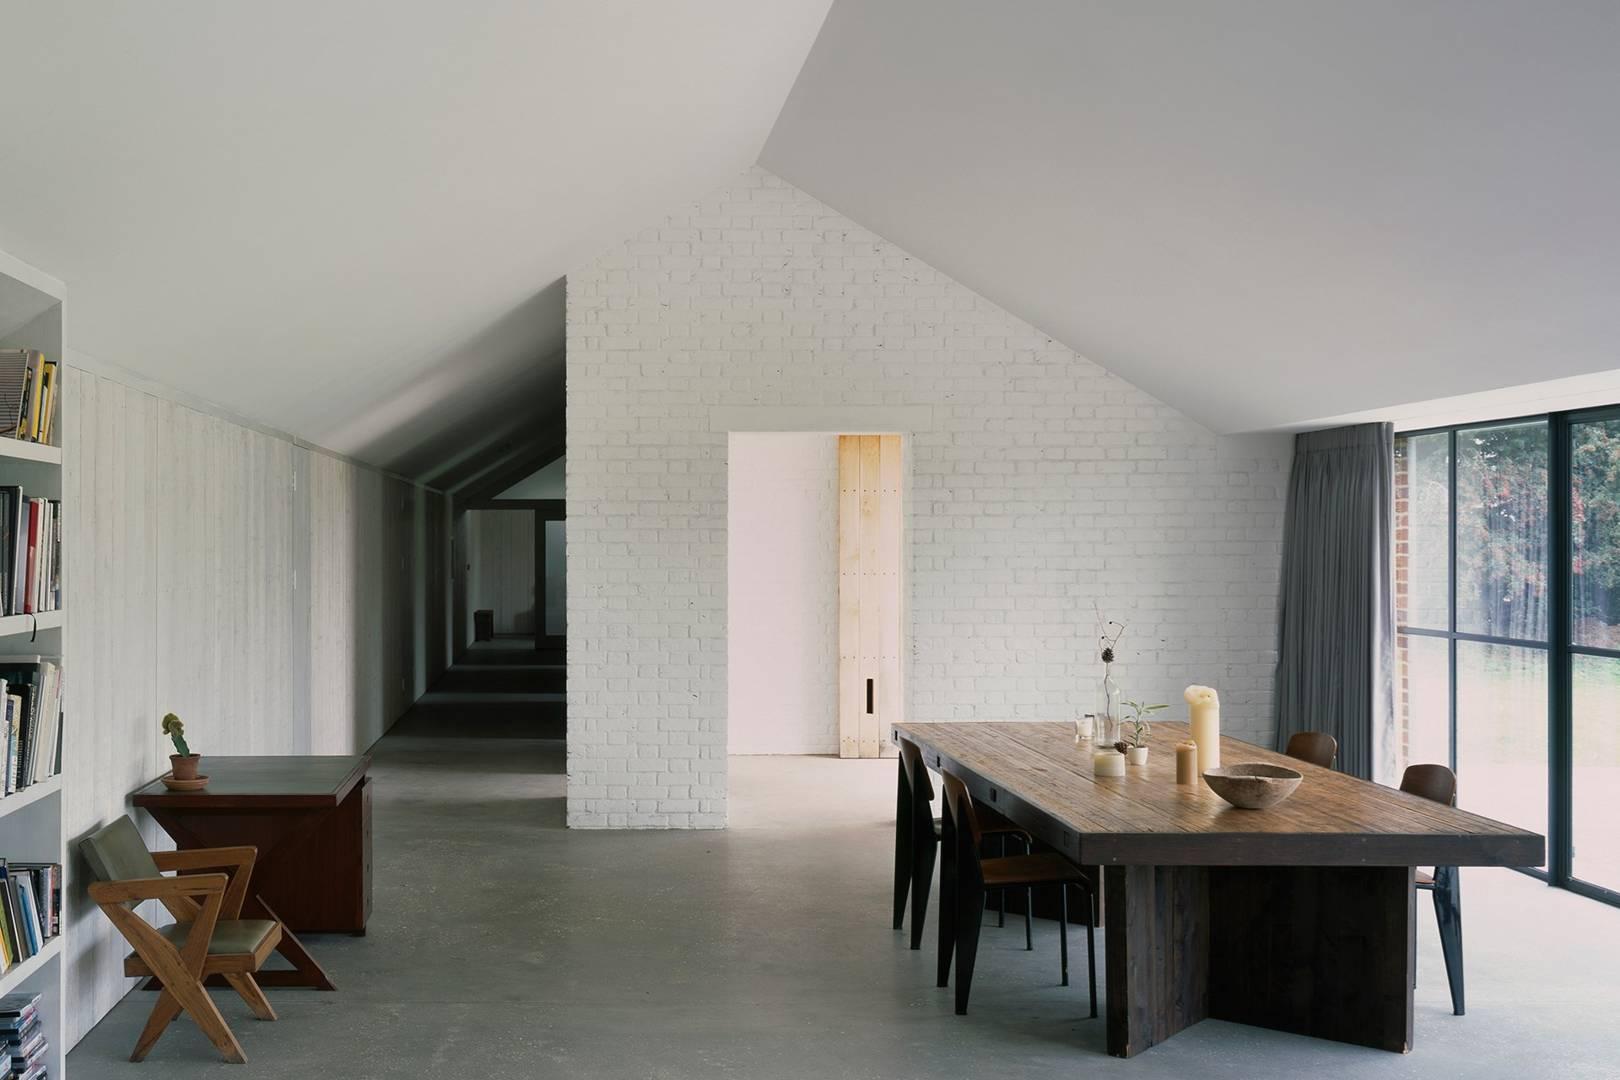 Best Modernist Houses sold on The Modern House | House & Garden on